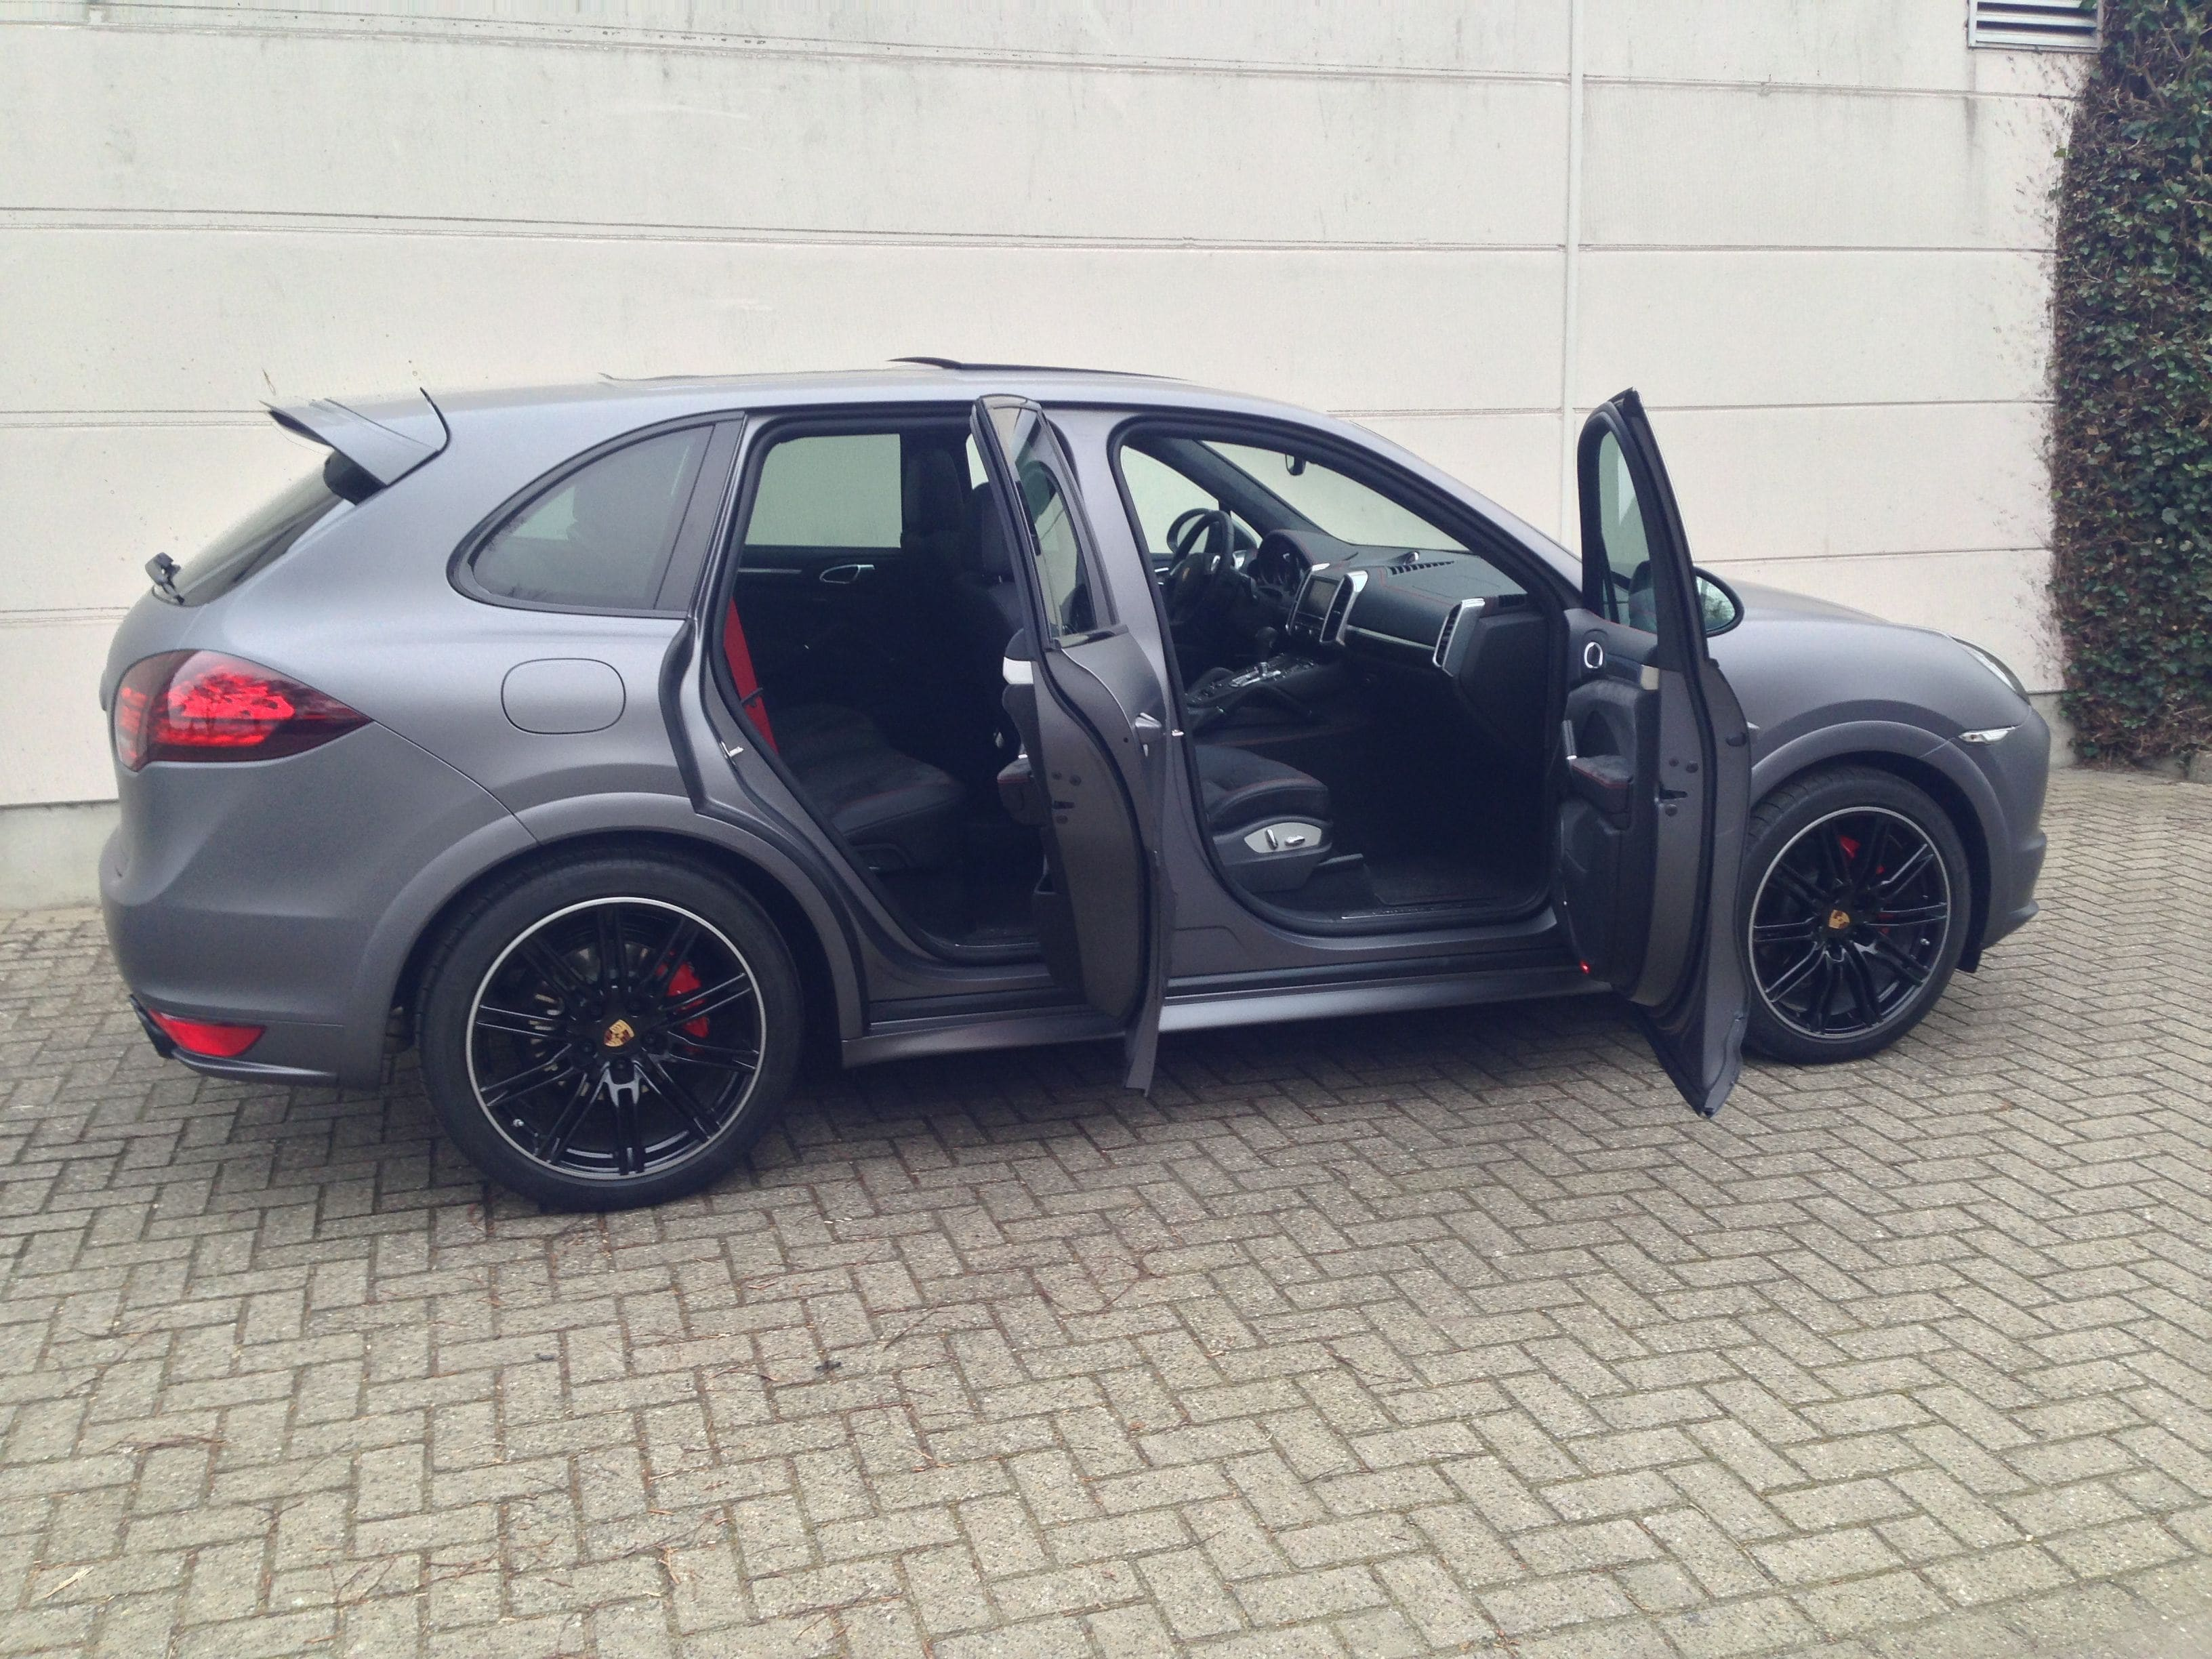 Porsche Cayenne GTS met Gunpowder Wrap, Carwrapping door Wrapmyride.nu Foto-nr:6788, ©2020